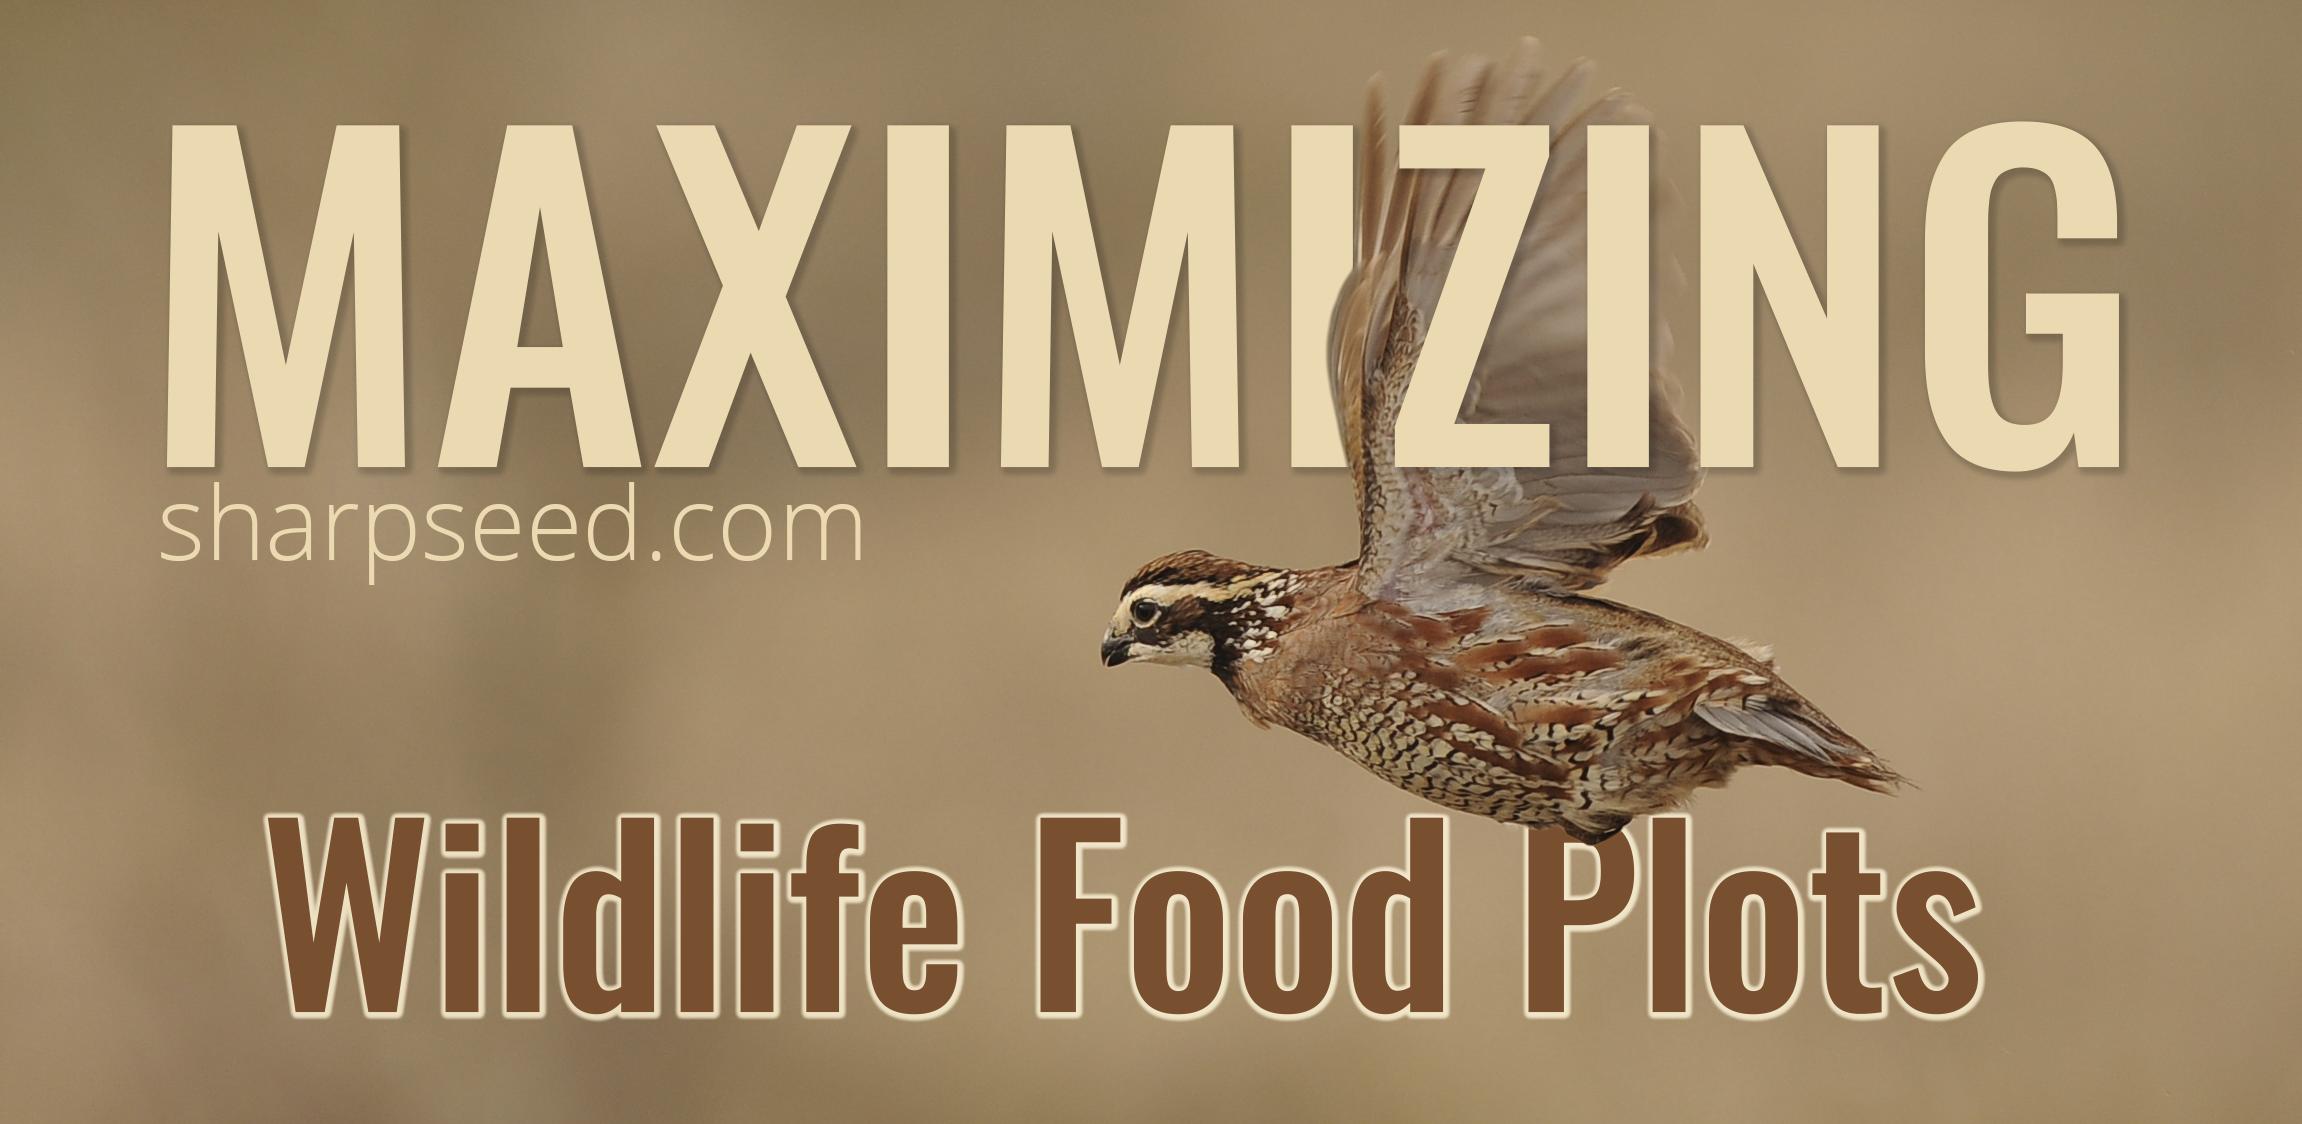 Maximizing Wildlife Food Plots